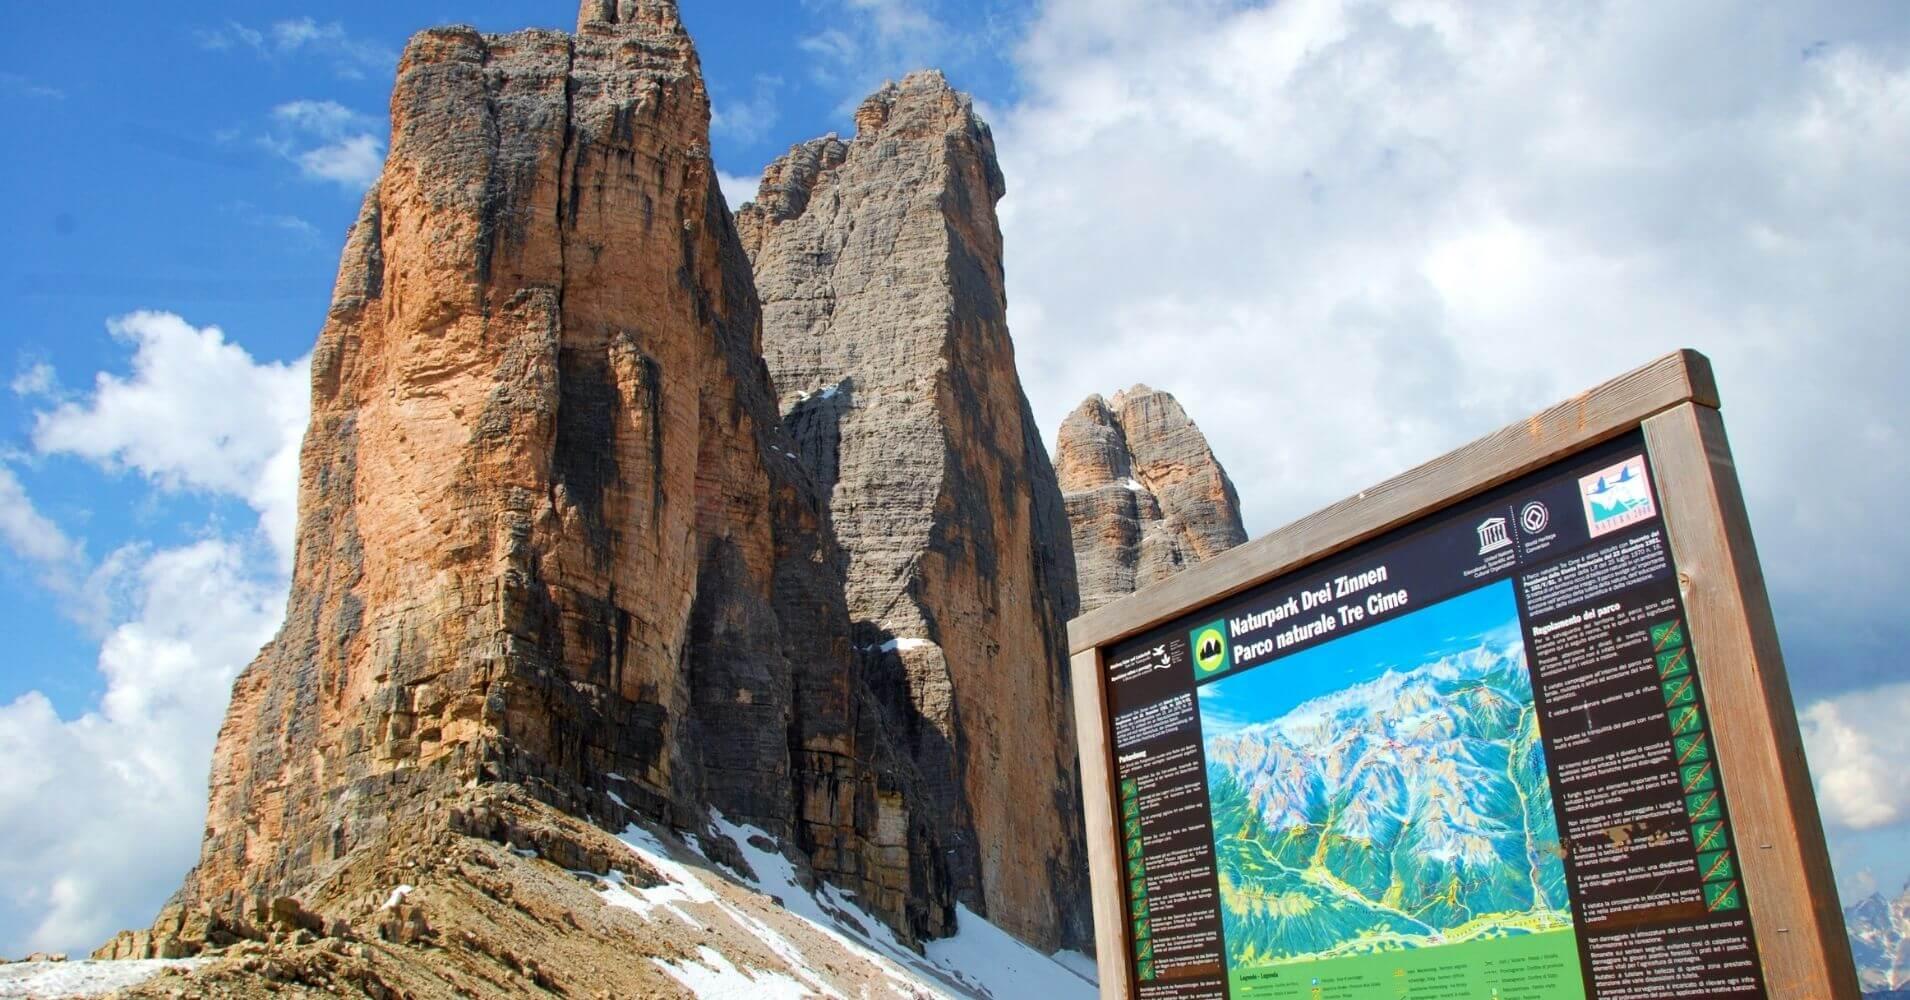 Parque Natural Tres Cimas de Lavaredo. Belluno, Véneto. Italia.